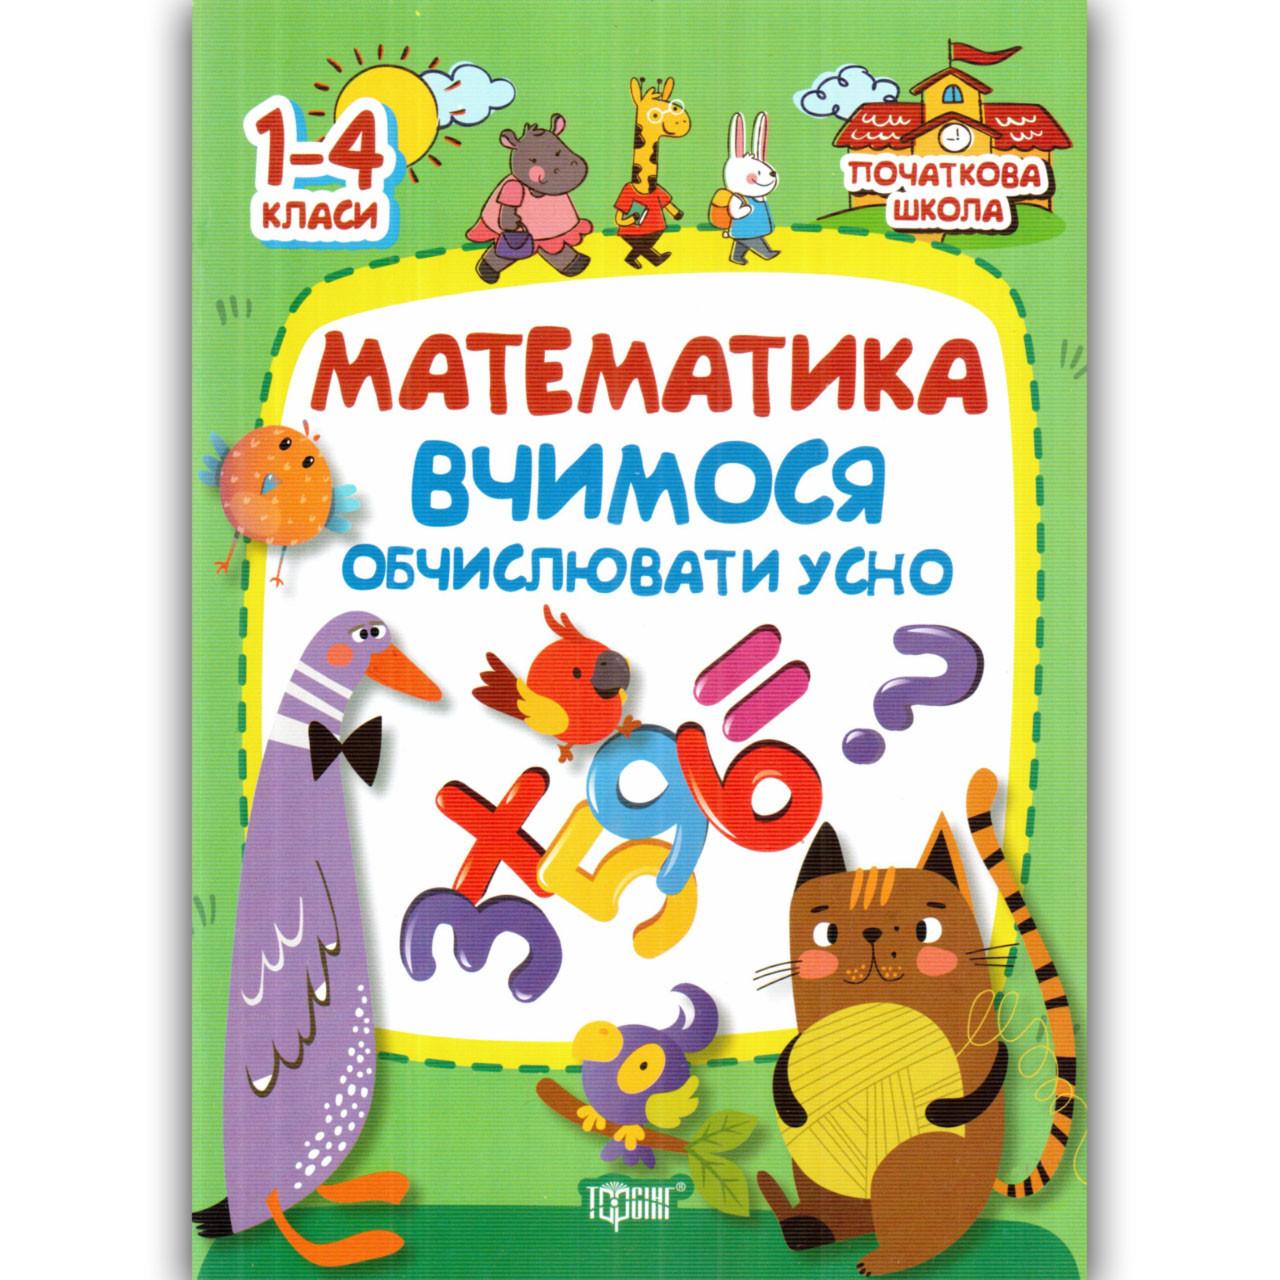 Математика Вчимося обчислювати усно 1-4 класи Авт: Заїка А. Вид: Торсінг